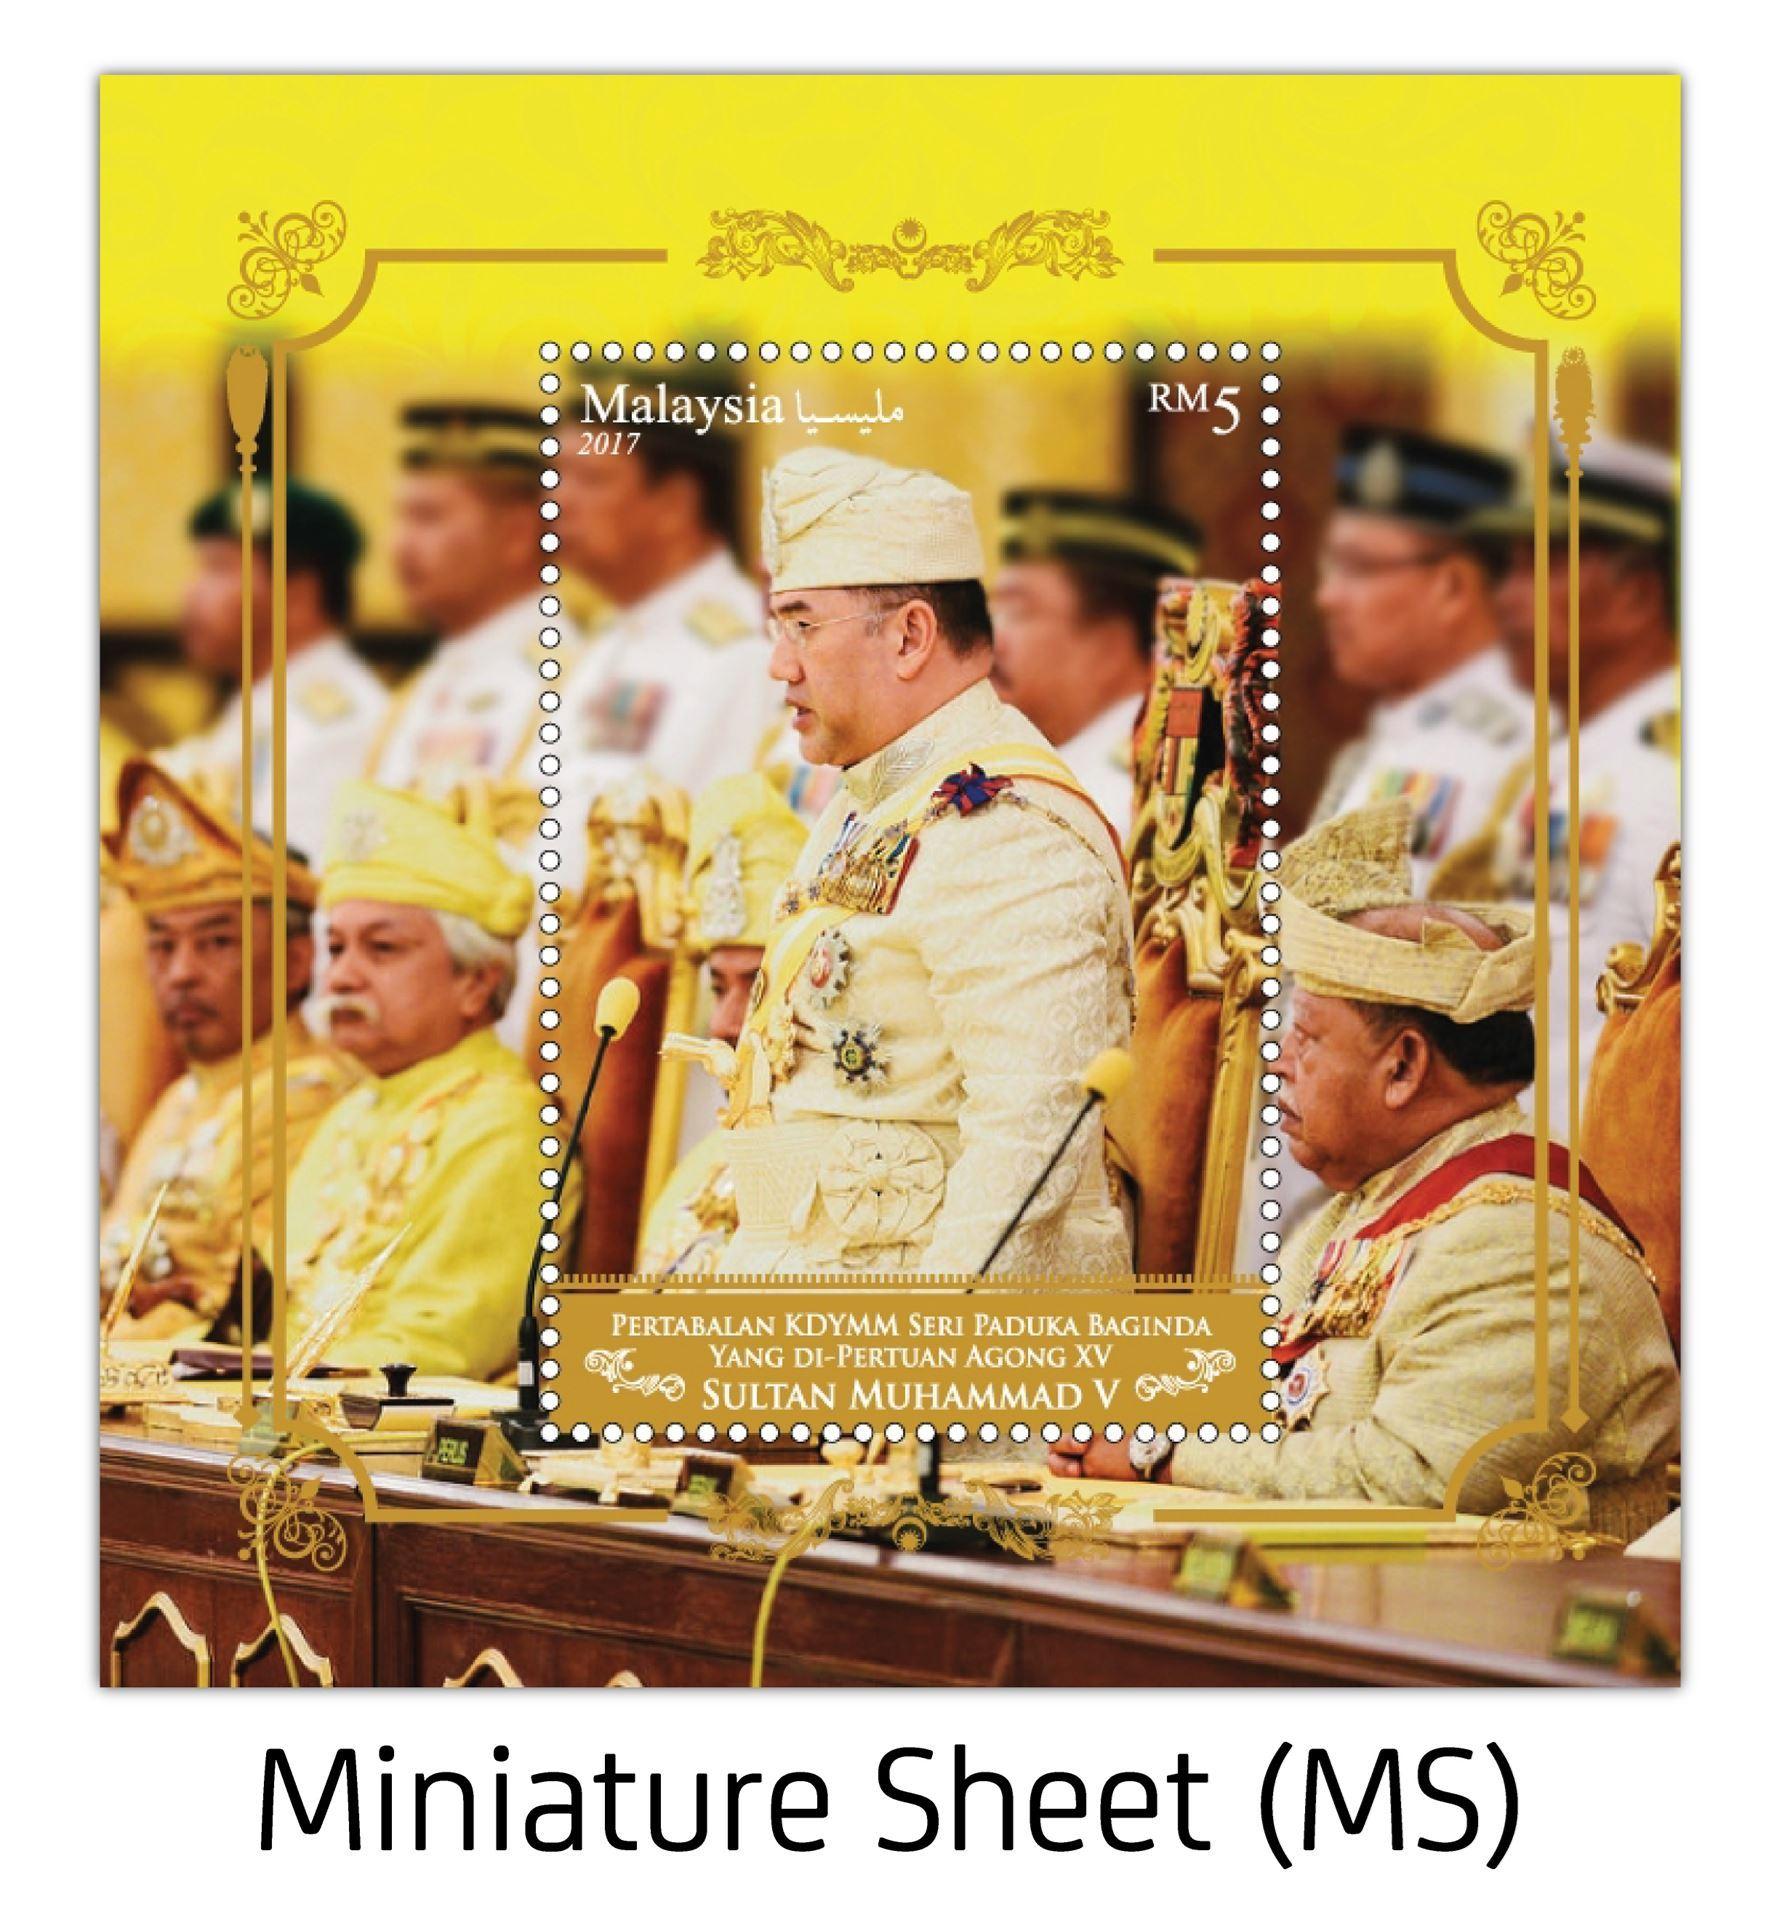 0002434_ms-pertabalan-kydmm-seri-paduka-baginda-yang-di-pertuan-agong-xv-sultan-muhammad